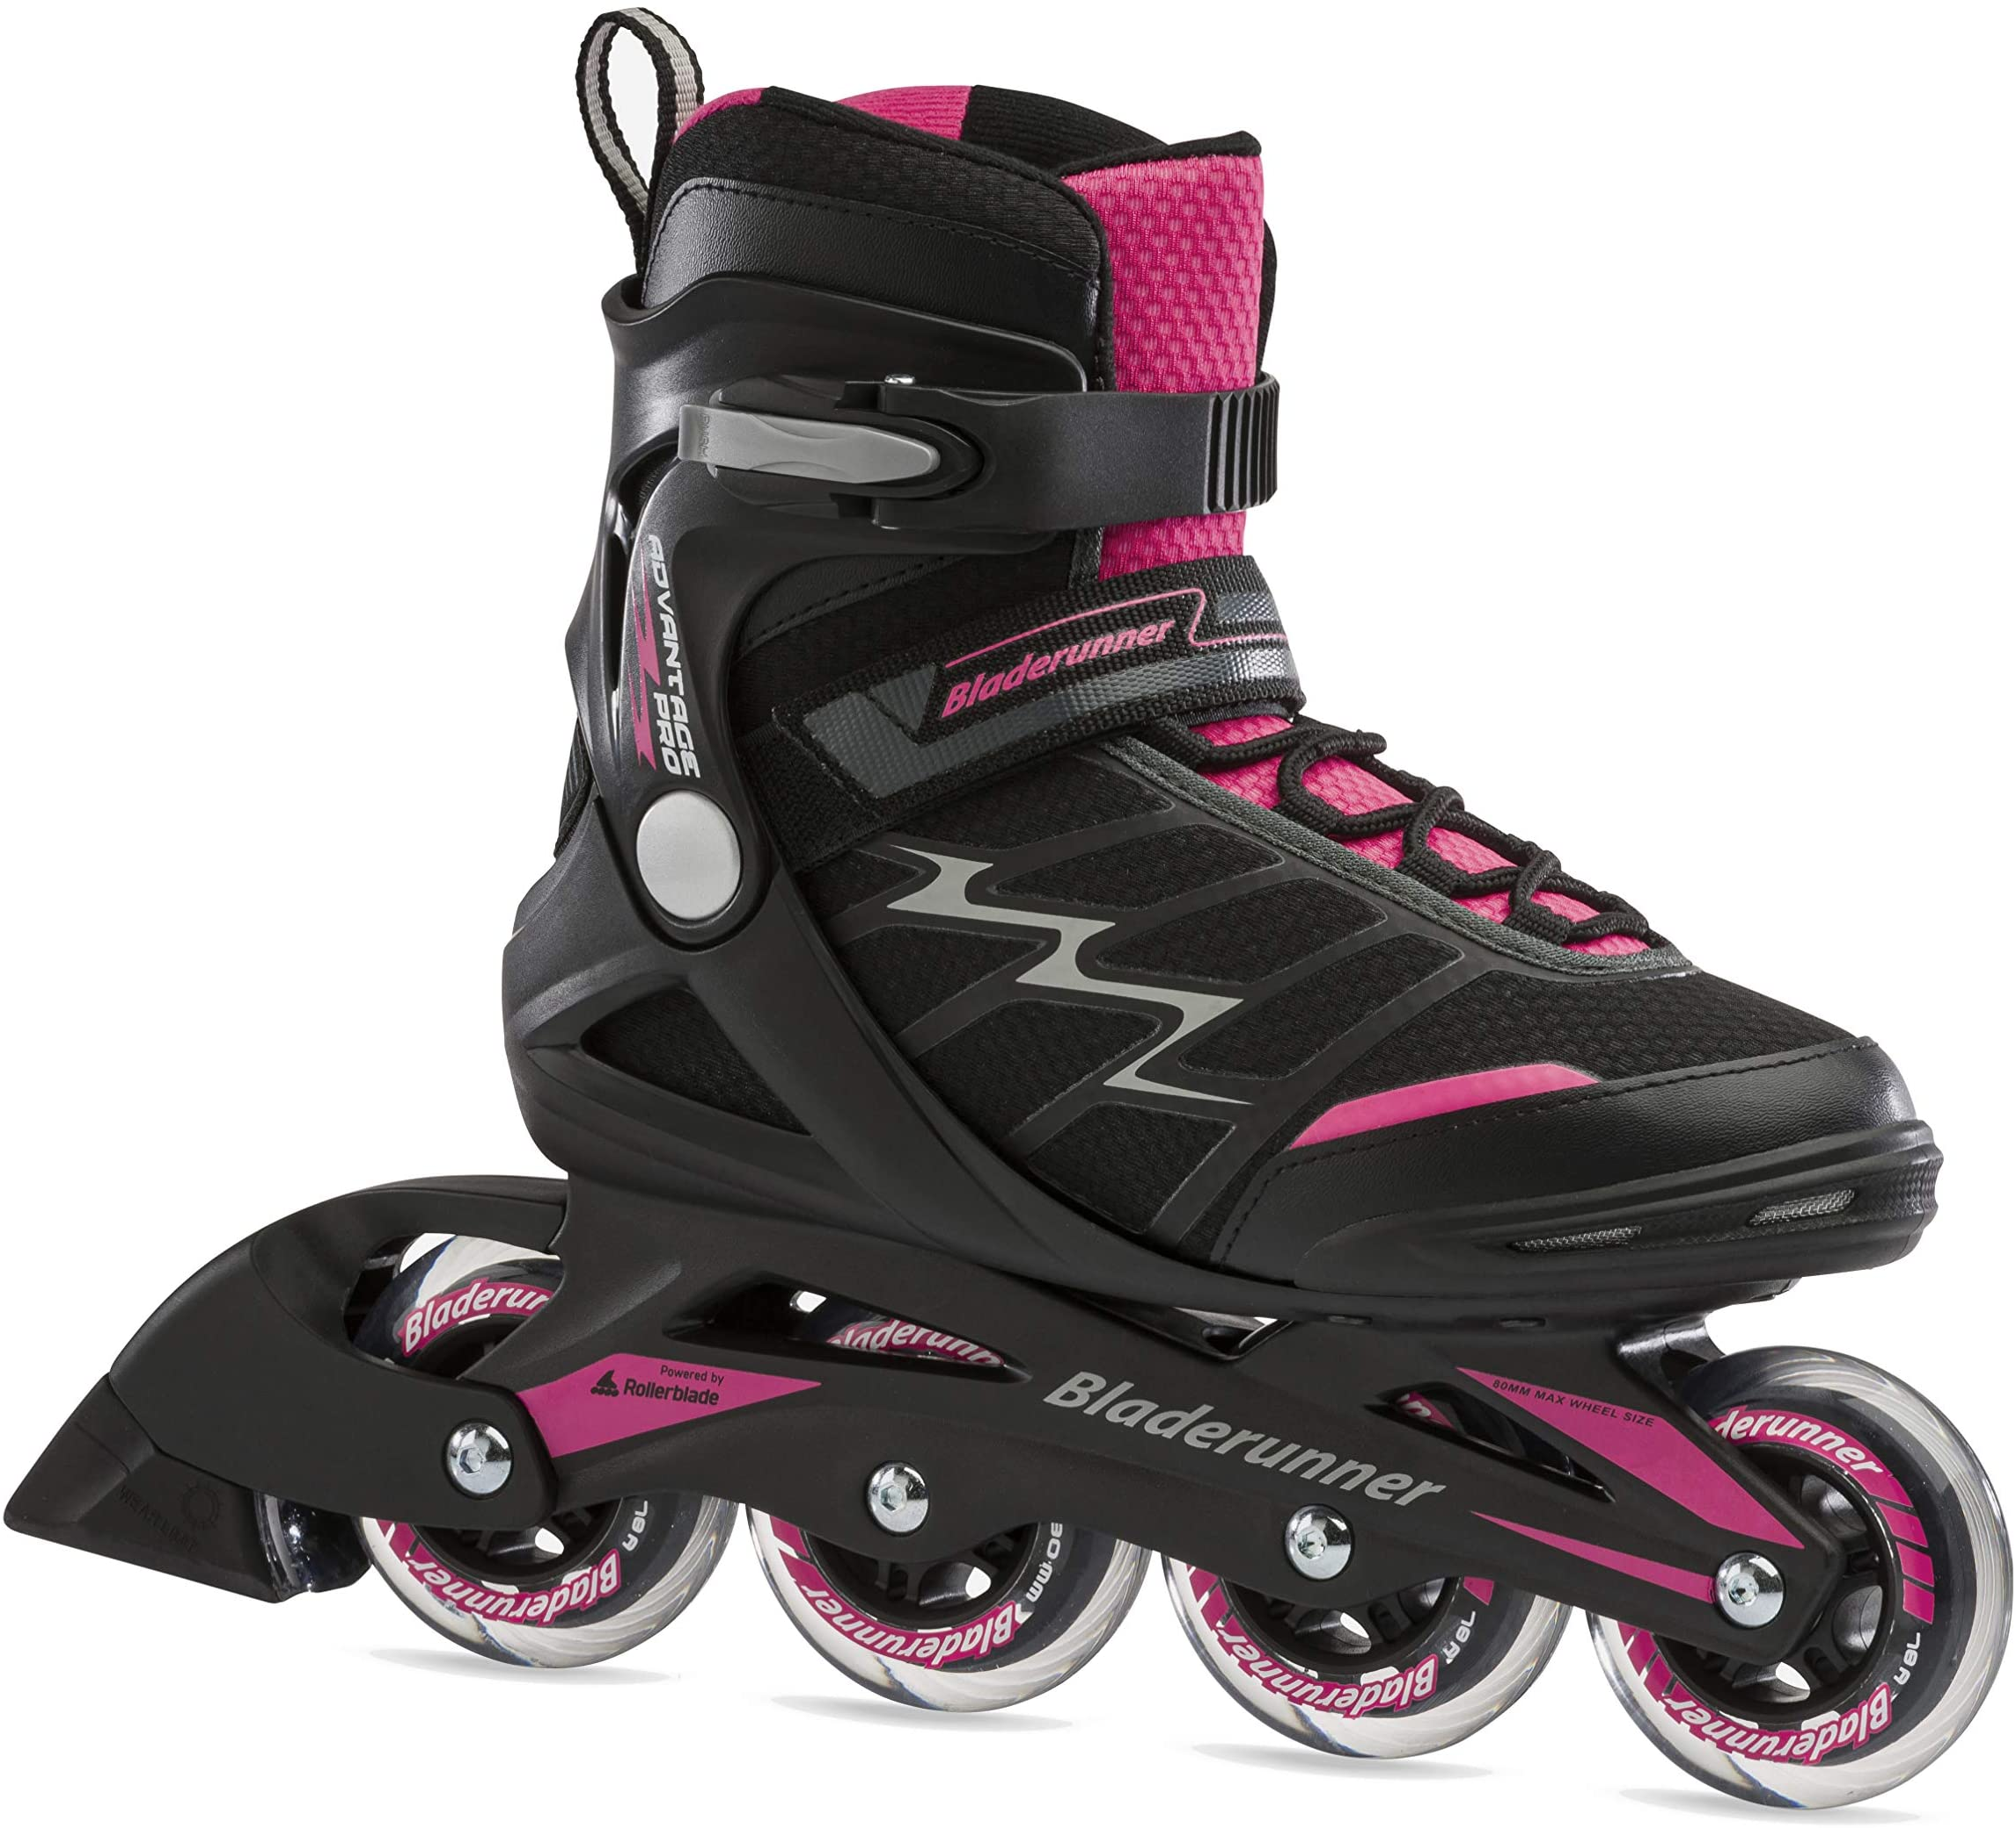 Bladerunner by Rollerblade Advantage Pro XT Women's Adult Fitness Inline Skate, Pink and Black Inline Skates